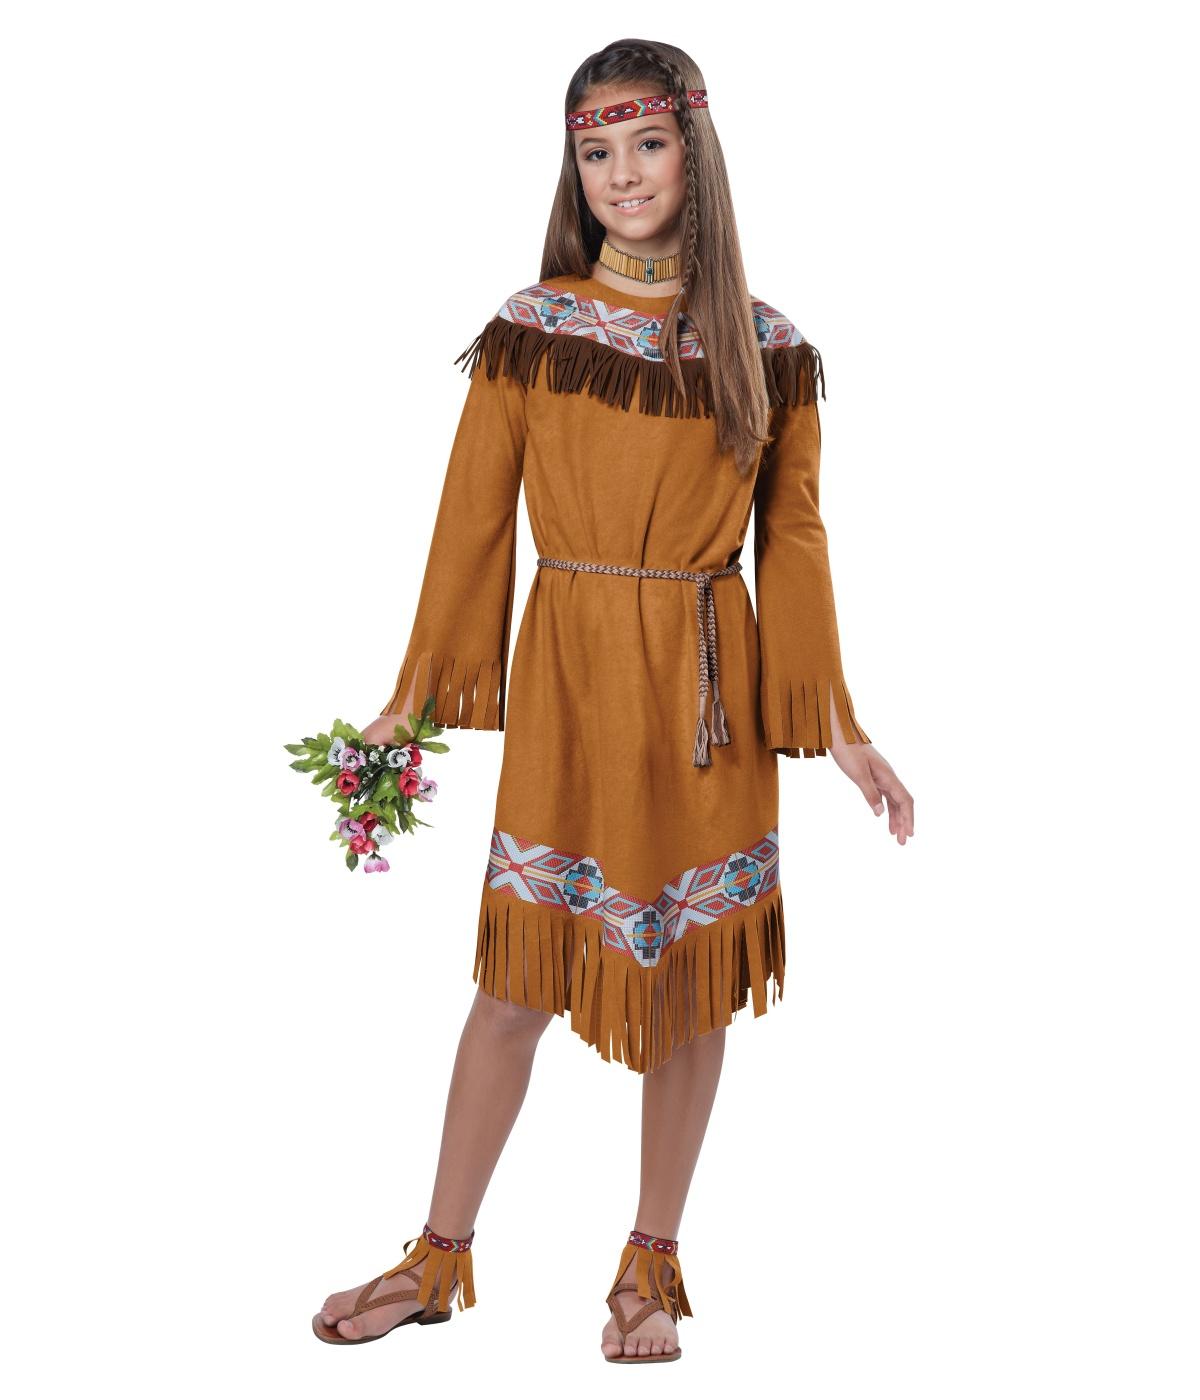 Classic Native American Indian Girl Costume